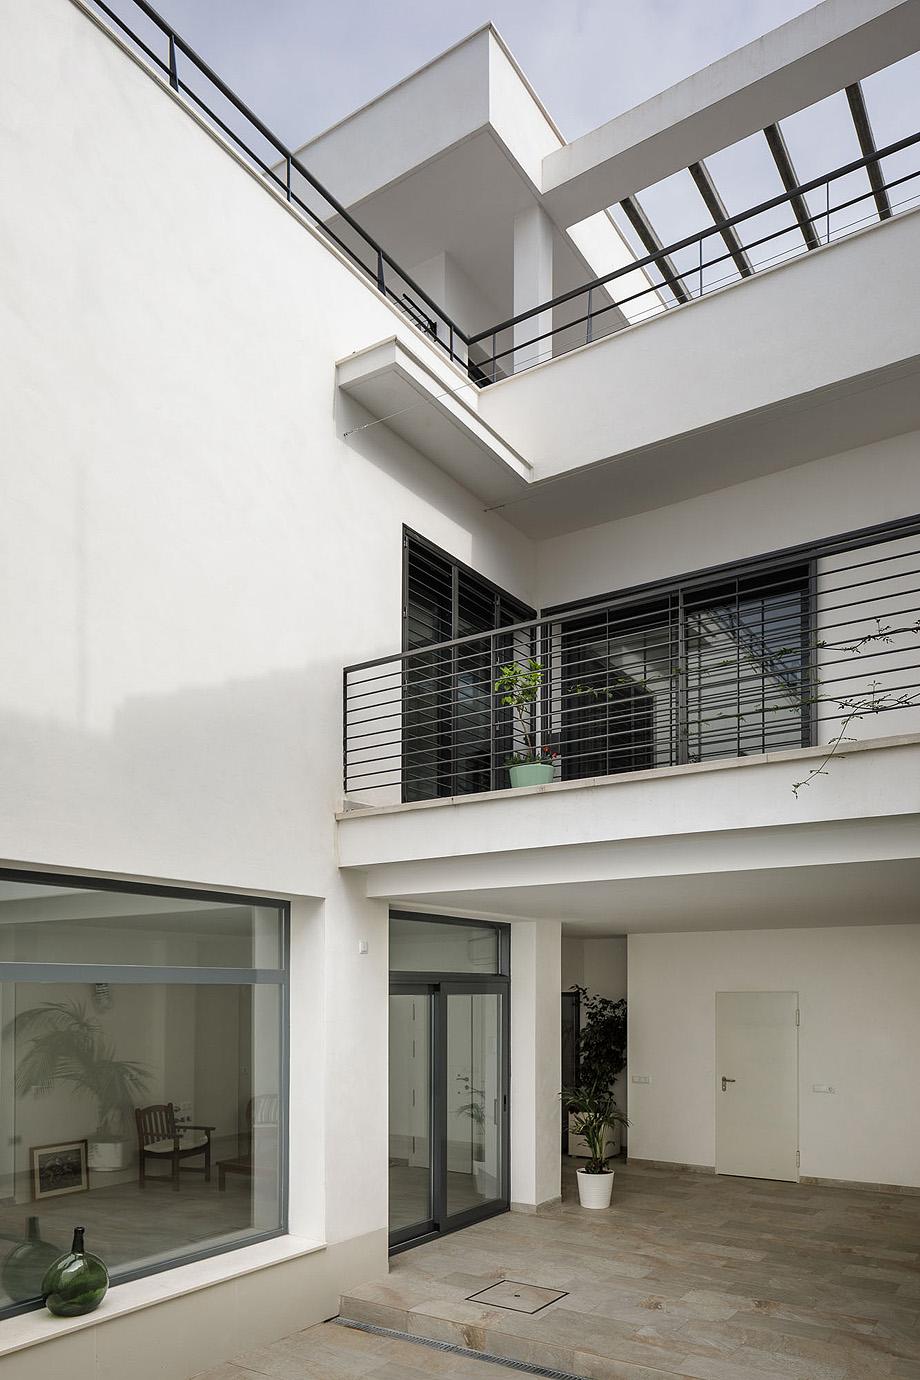 casa cr en sevilla de faq arquitectura - foto fernando alda (7)